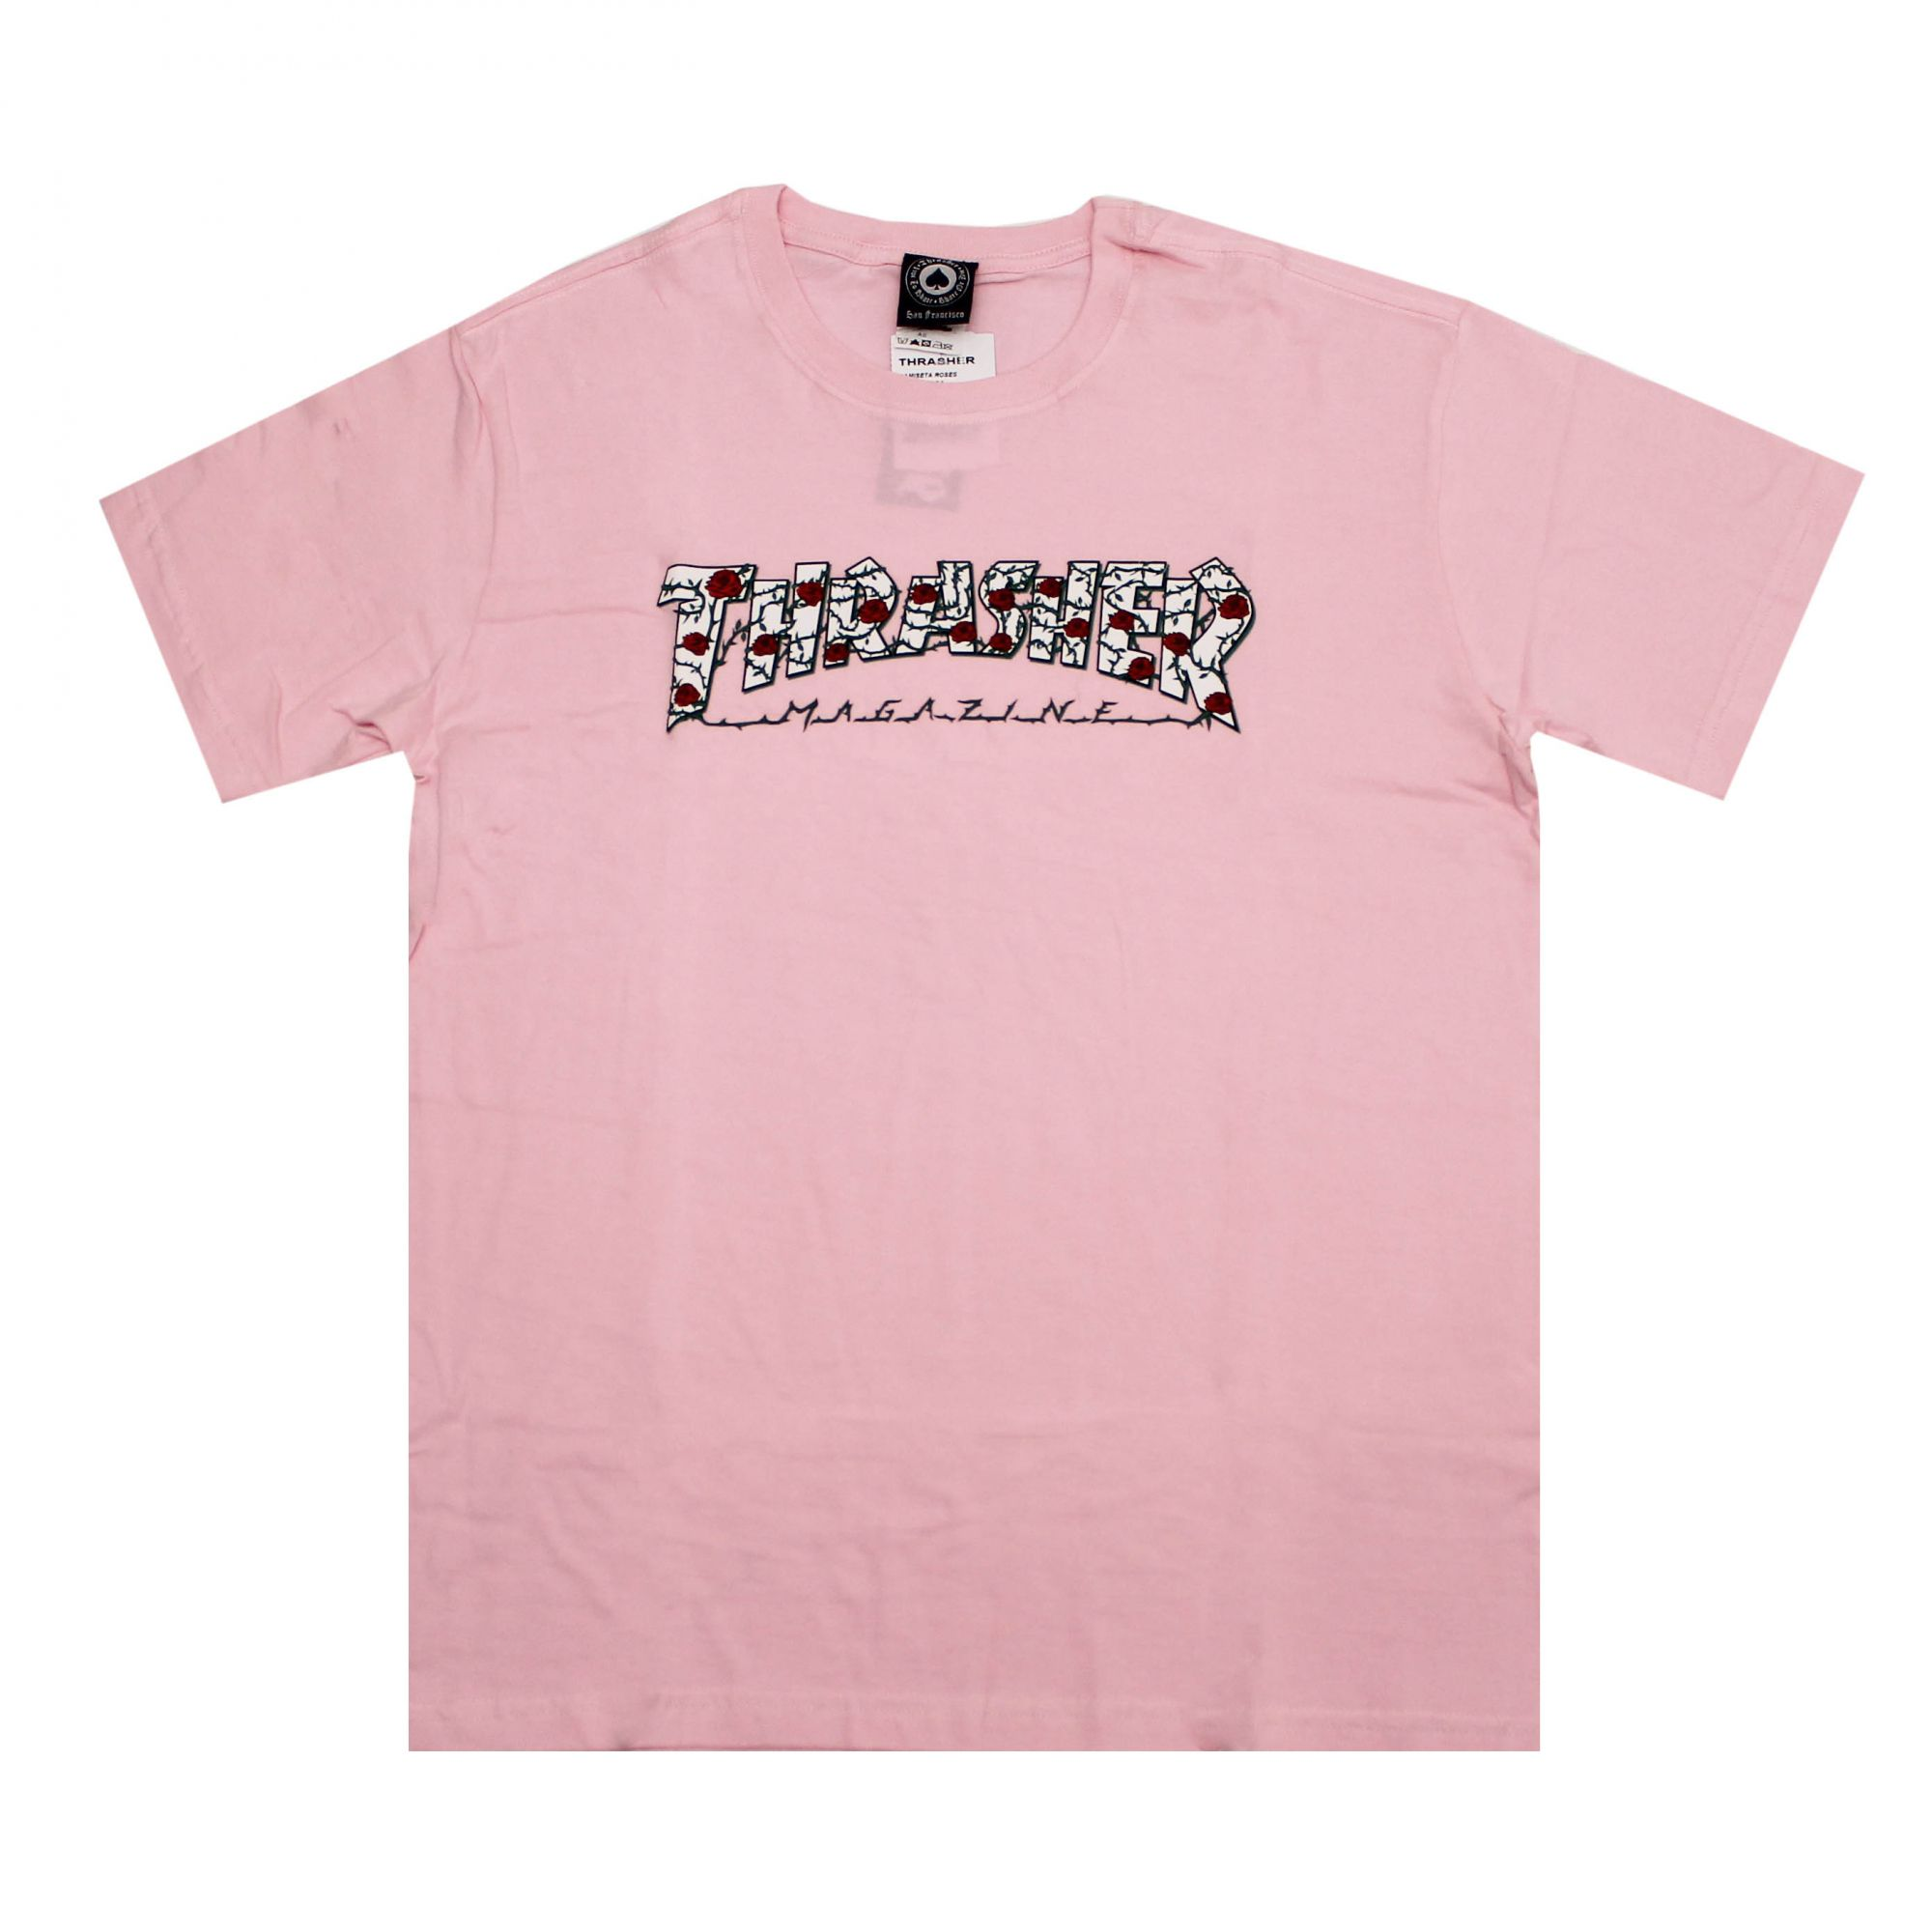 Camiseta Thrasher Magazine Roses - Rosa Claro